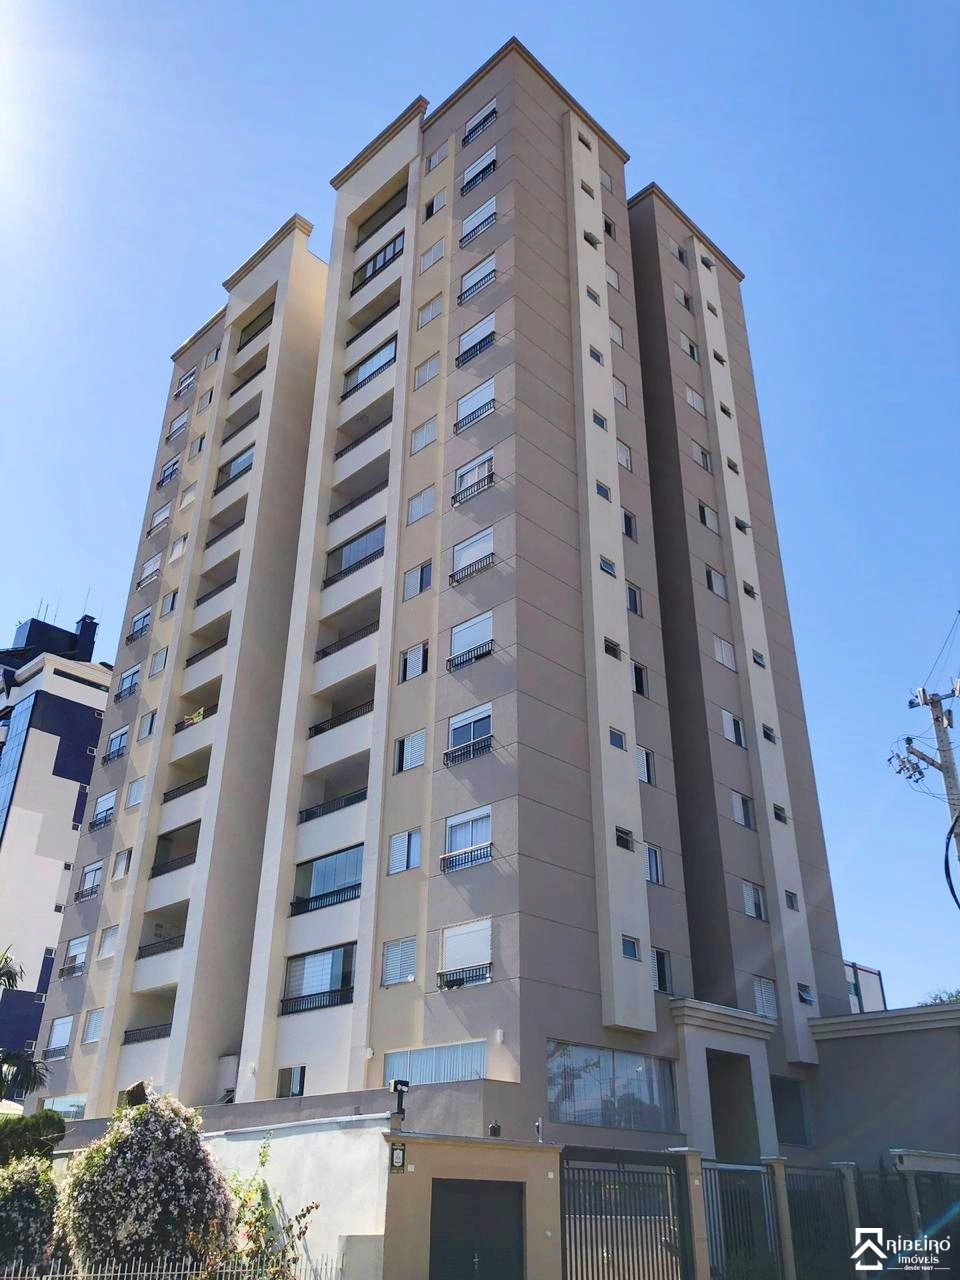 REF. 6497 -  São José Dos Pinhais - Rua  Coronel Luiz Victorino Ordine, 1035 - Apto 803